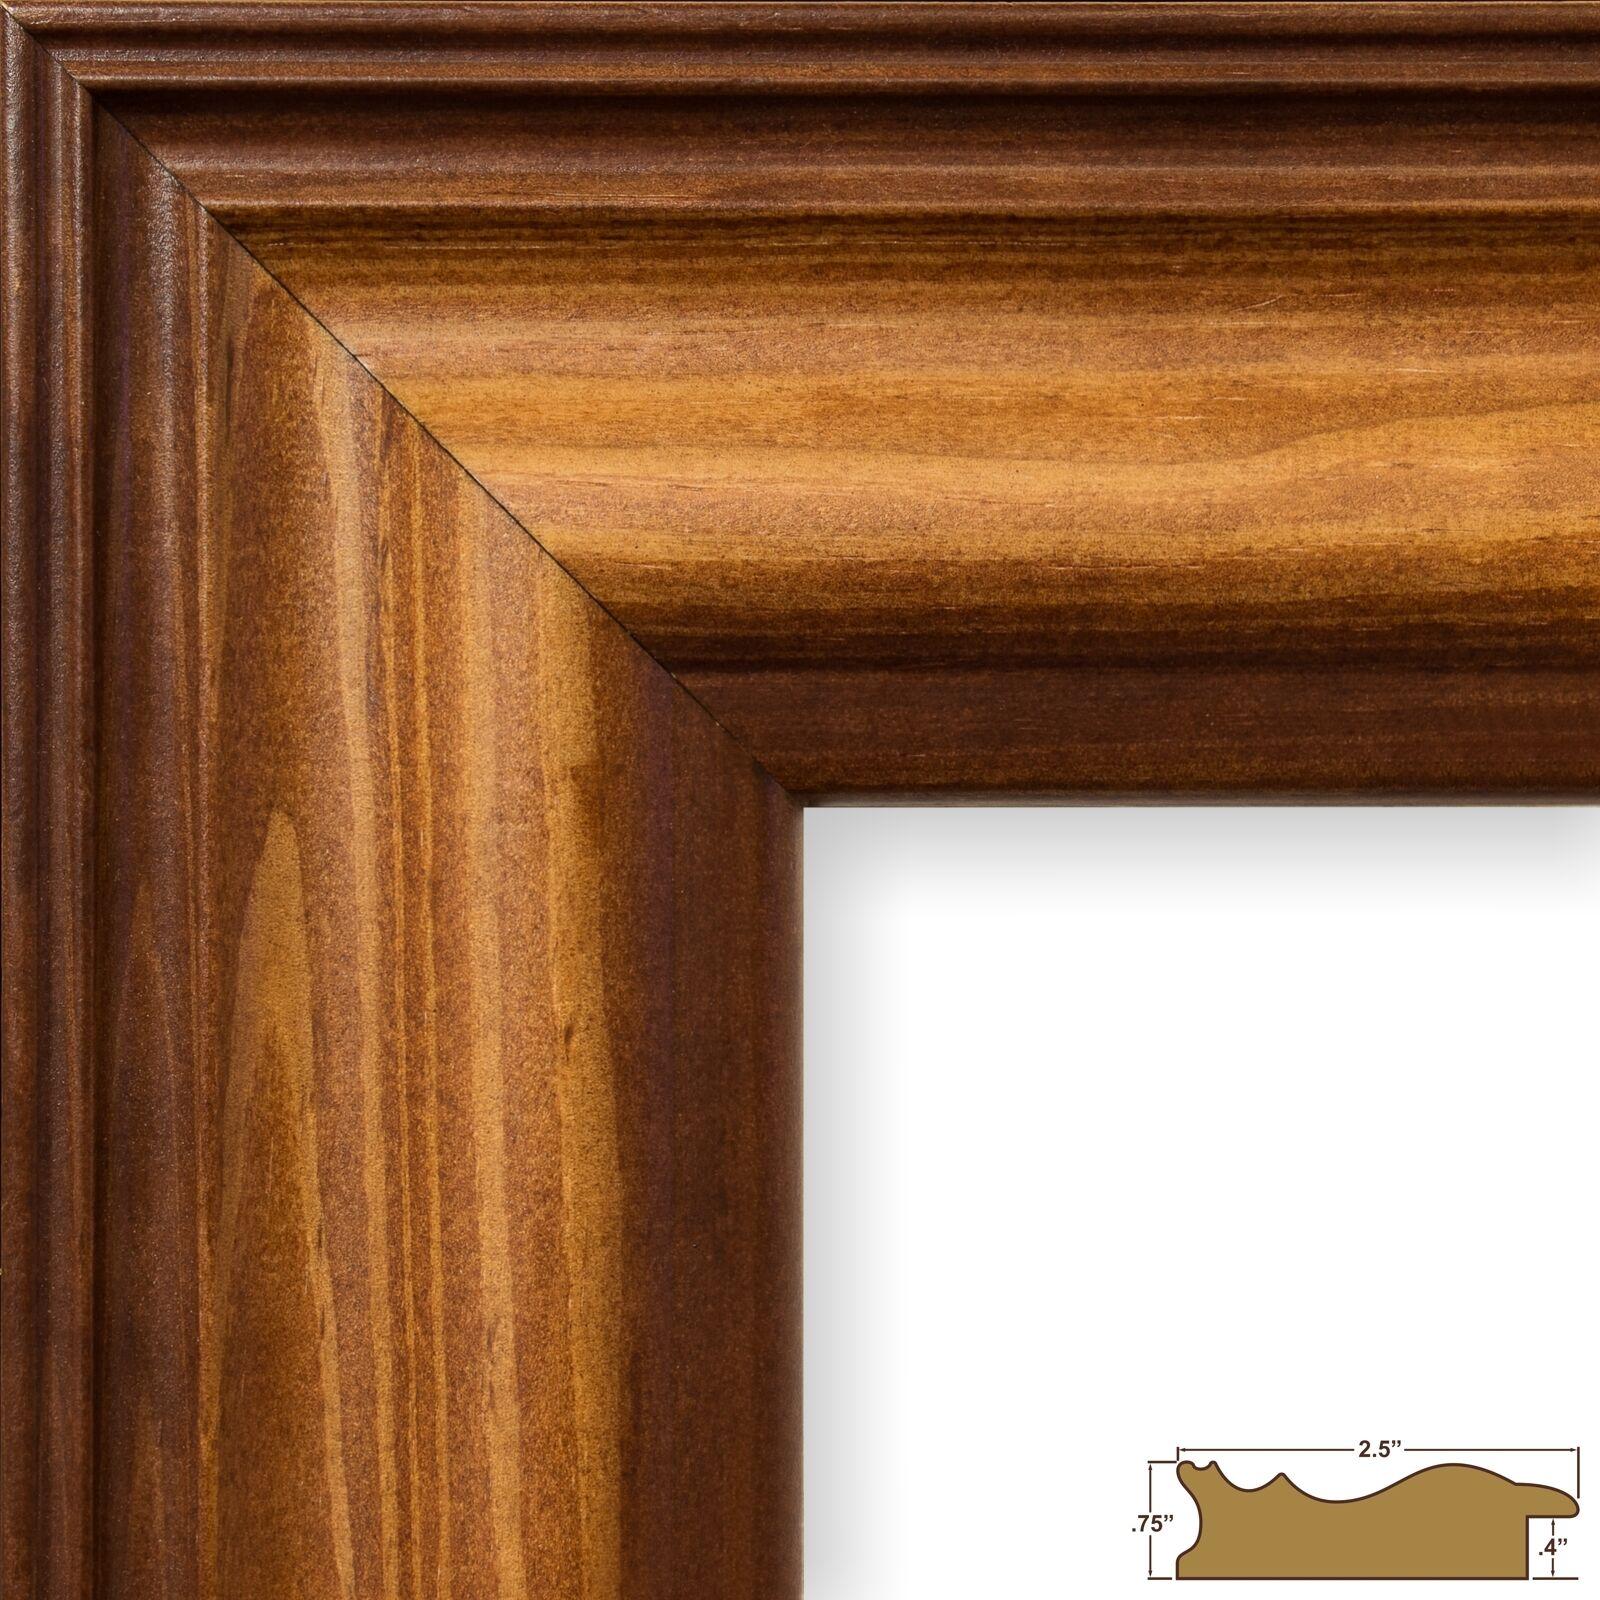 Craig frames americana walnut brown wood picture frame 1 single picture 1 of 10 jeuxipadfo Choice Image